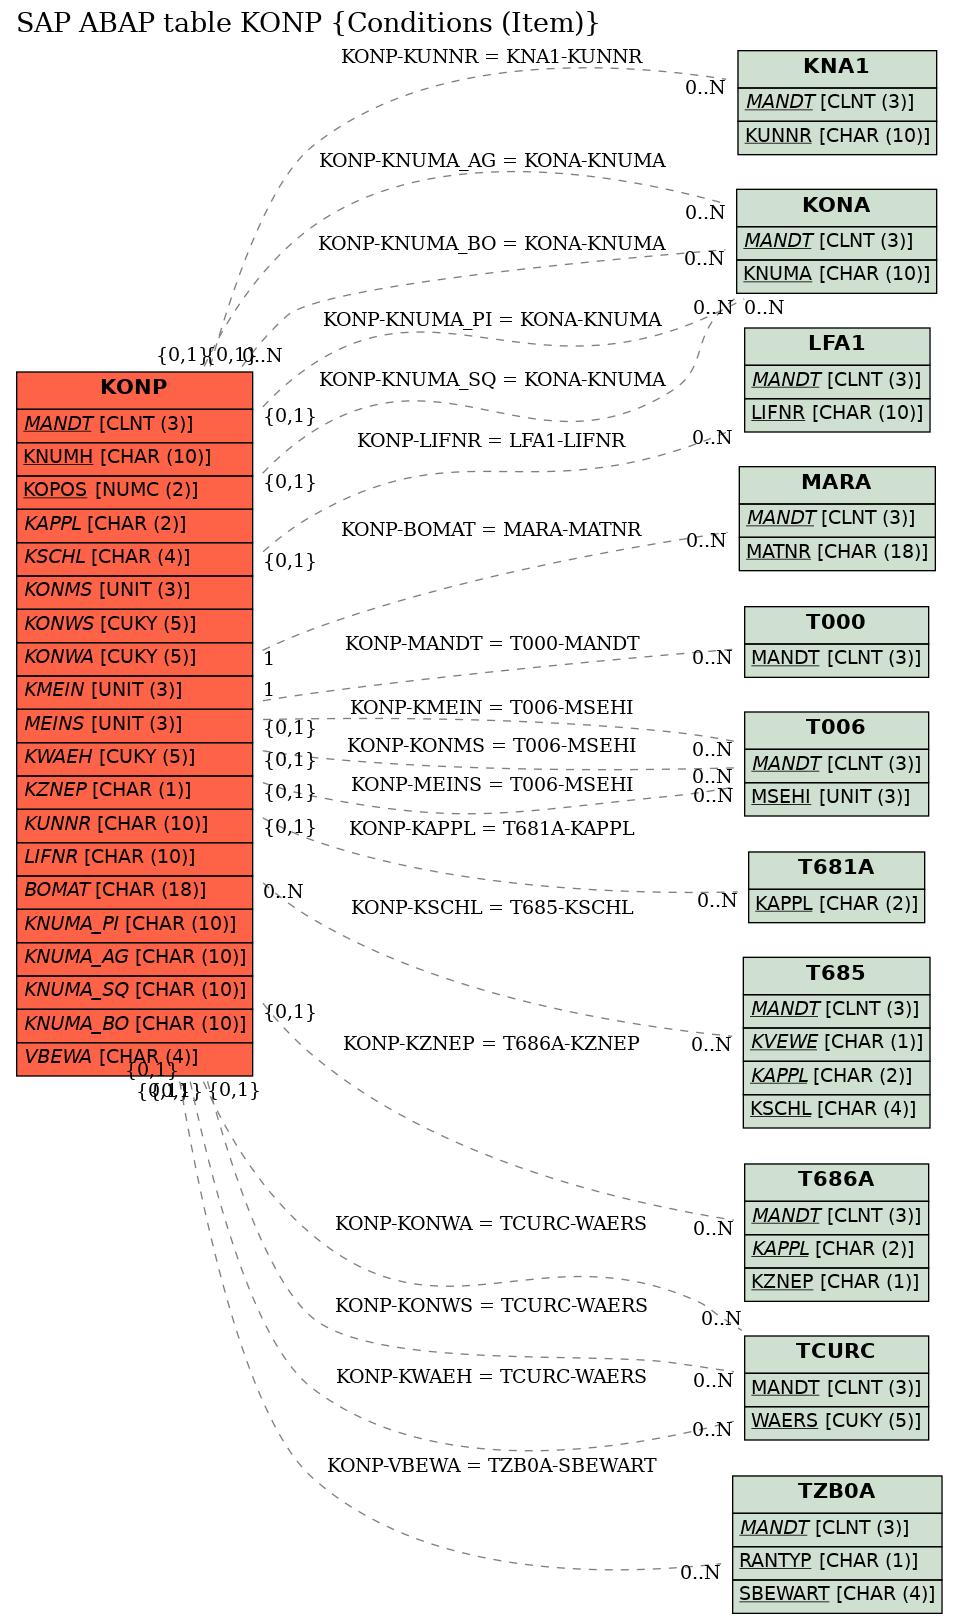 E-R Diagram for table KONP (Conditions (Item))